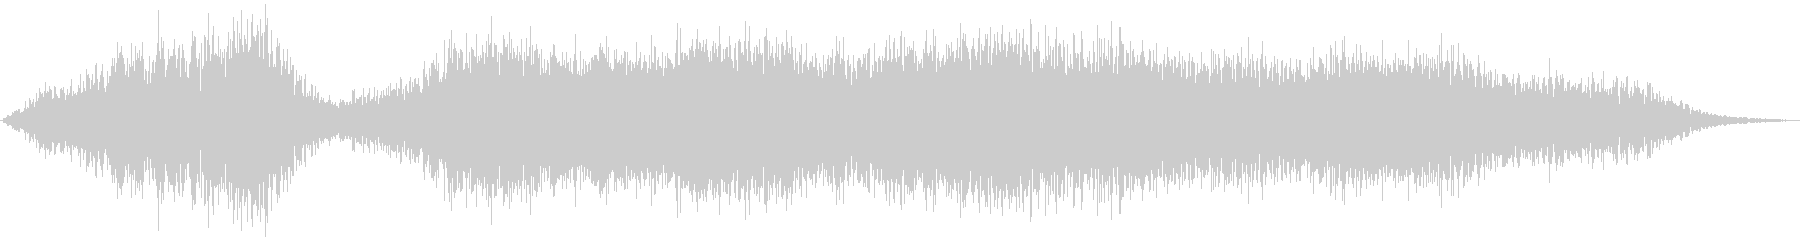 PADS 底流01の未再生の波形